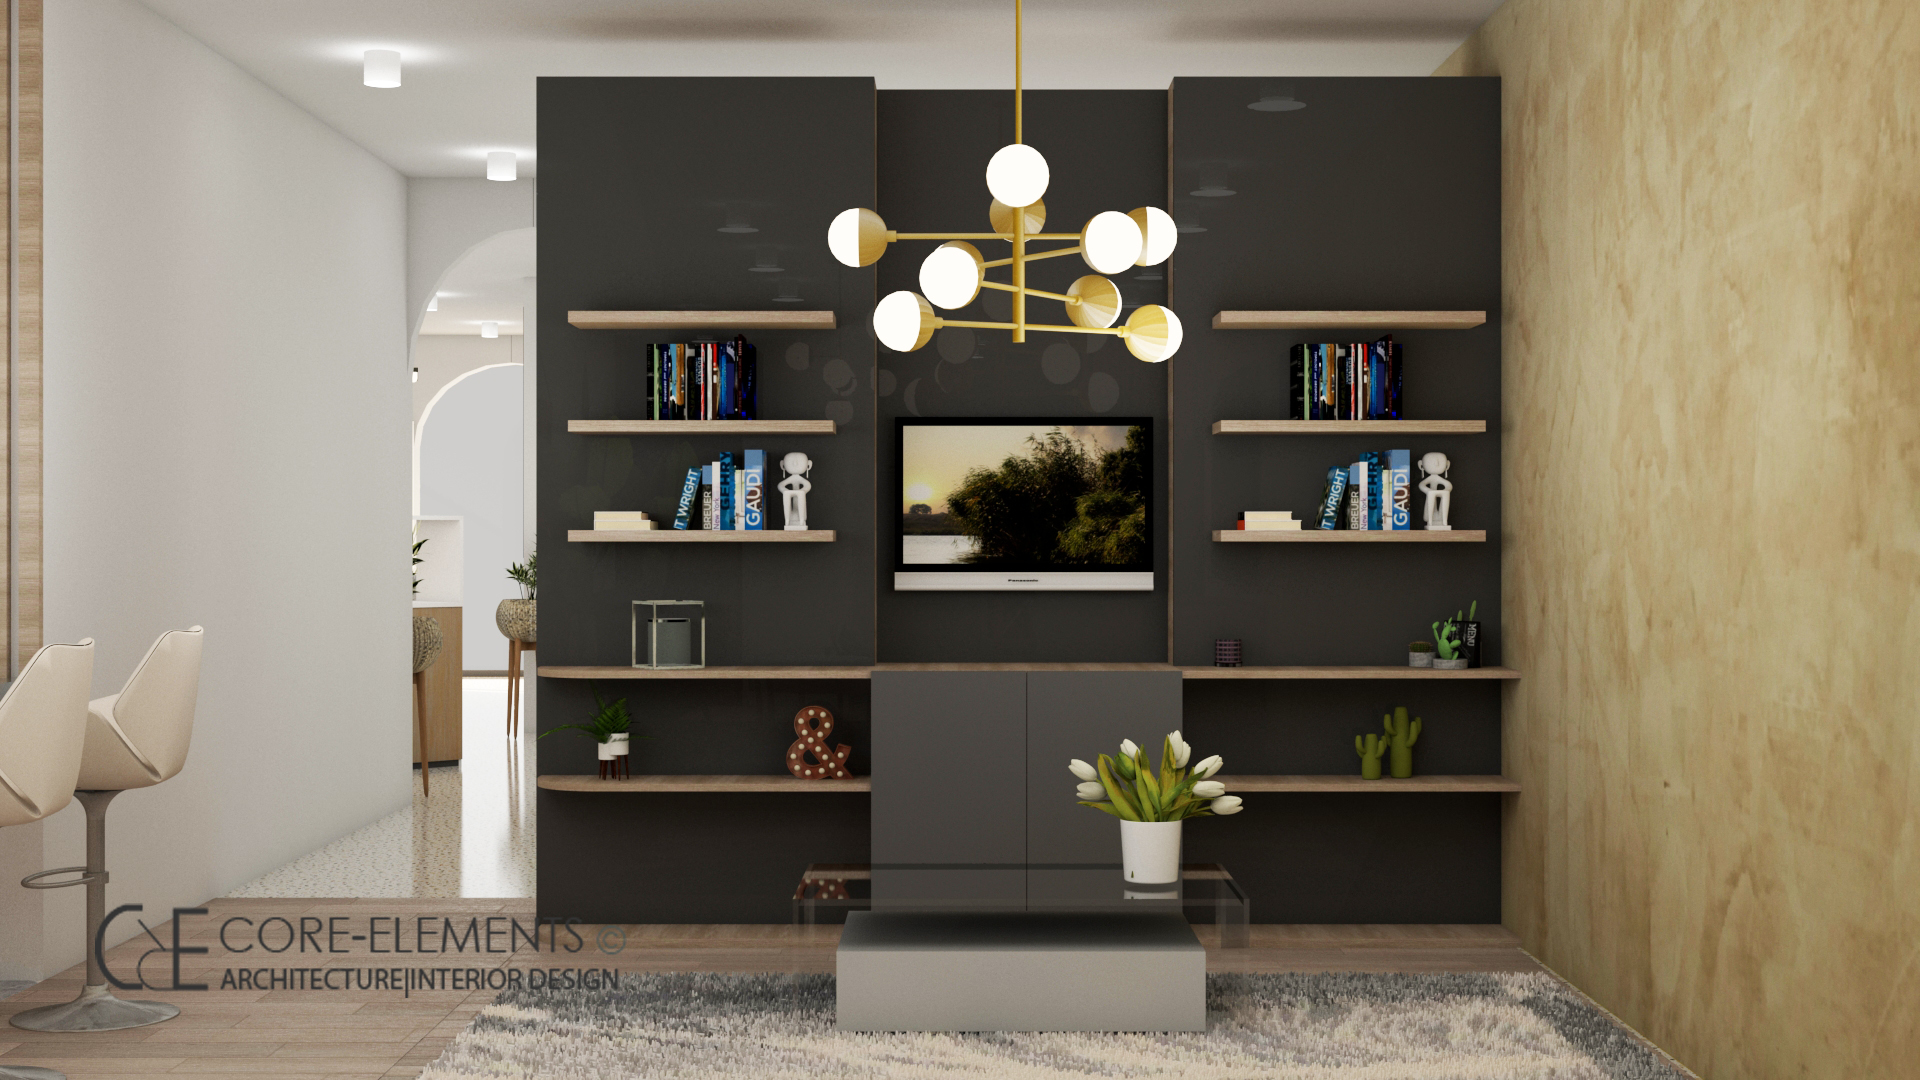 2. Living room I